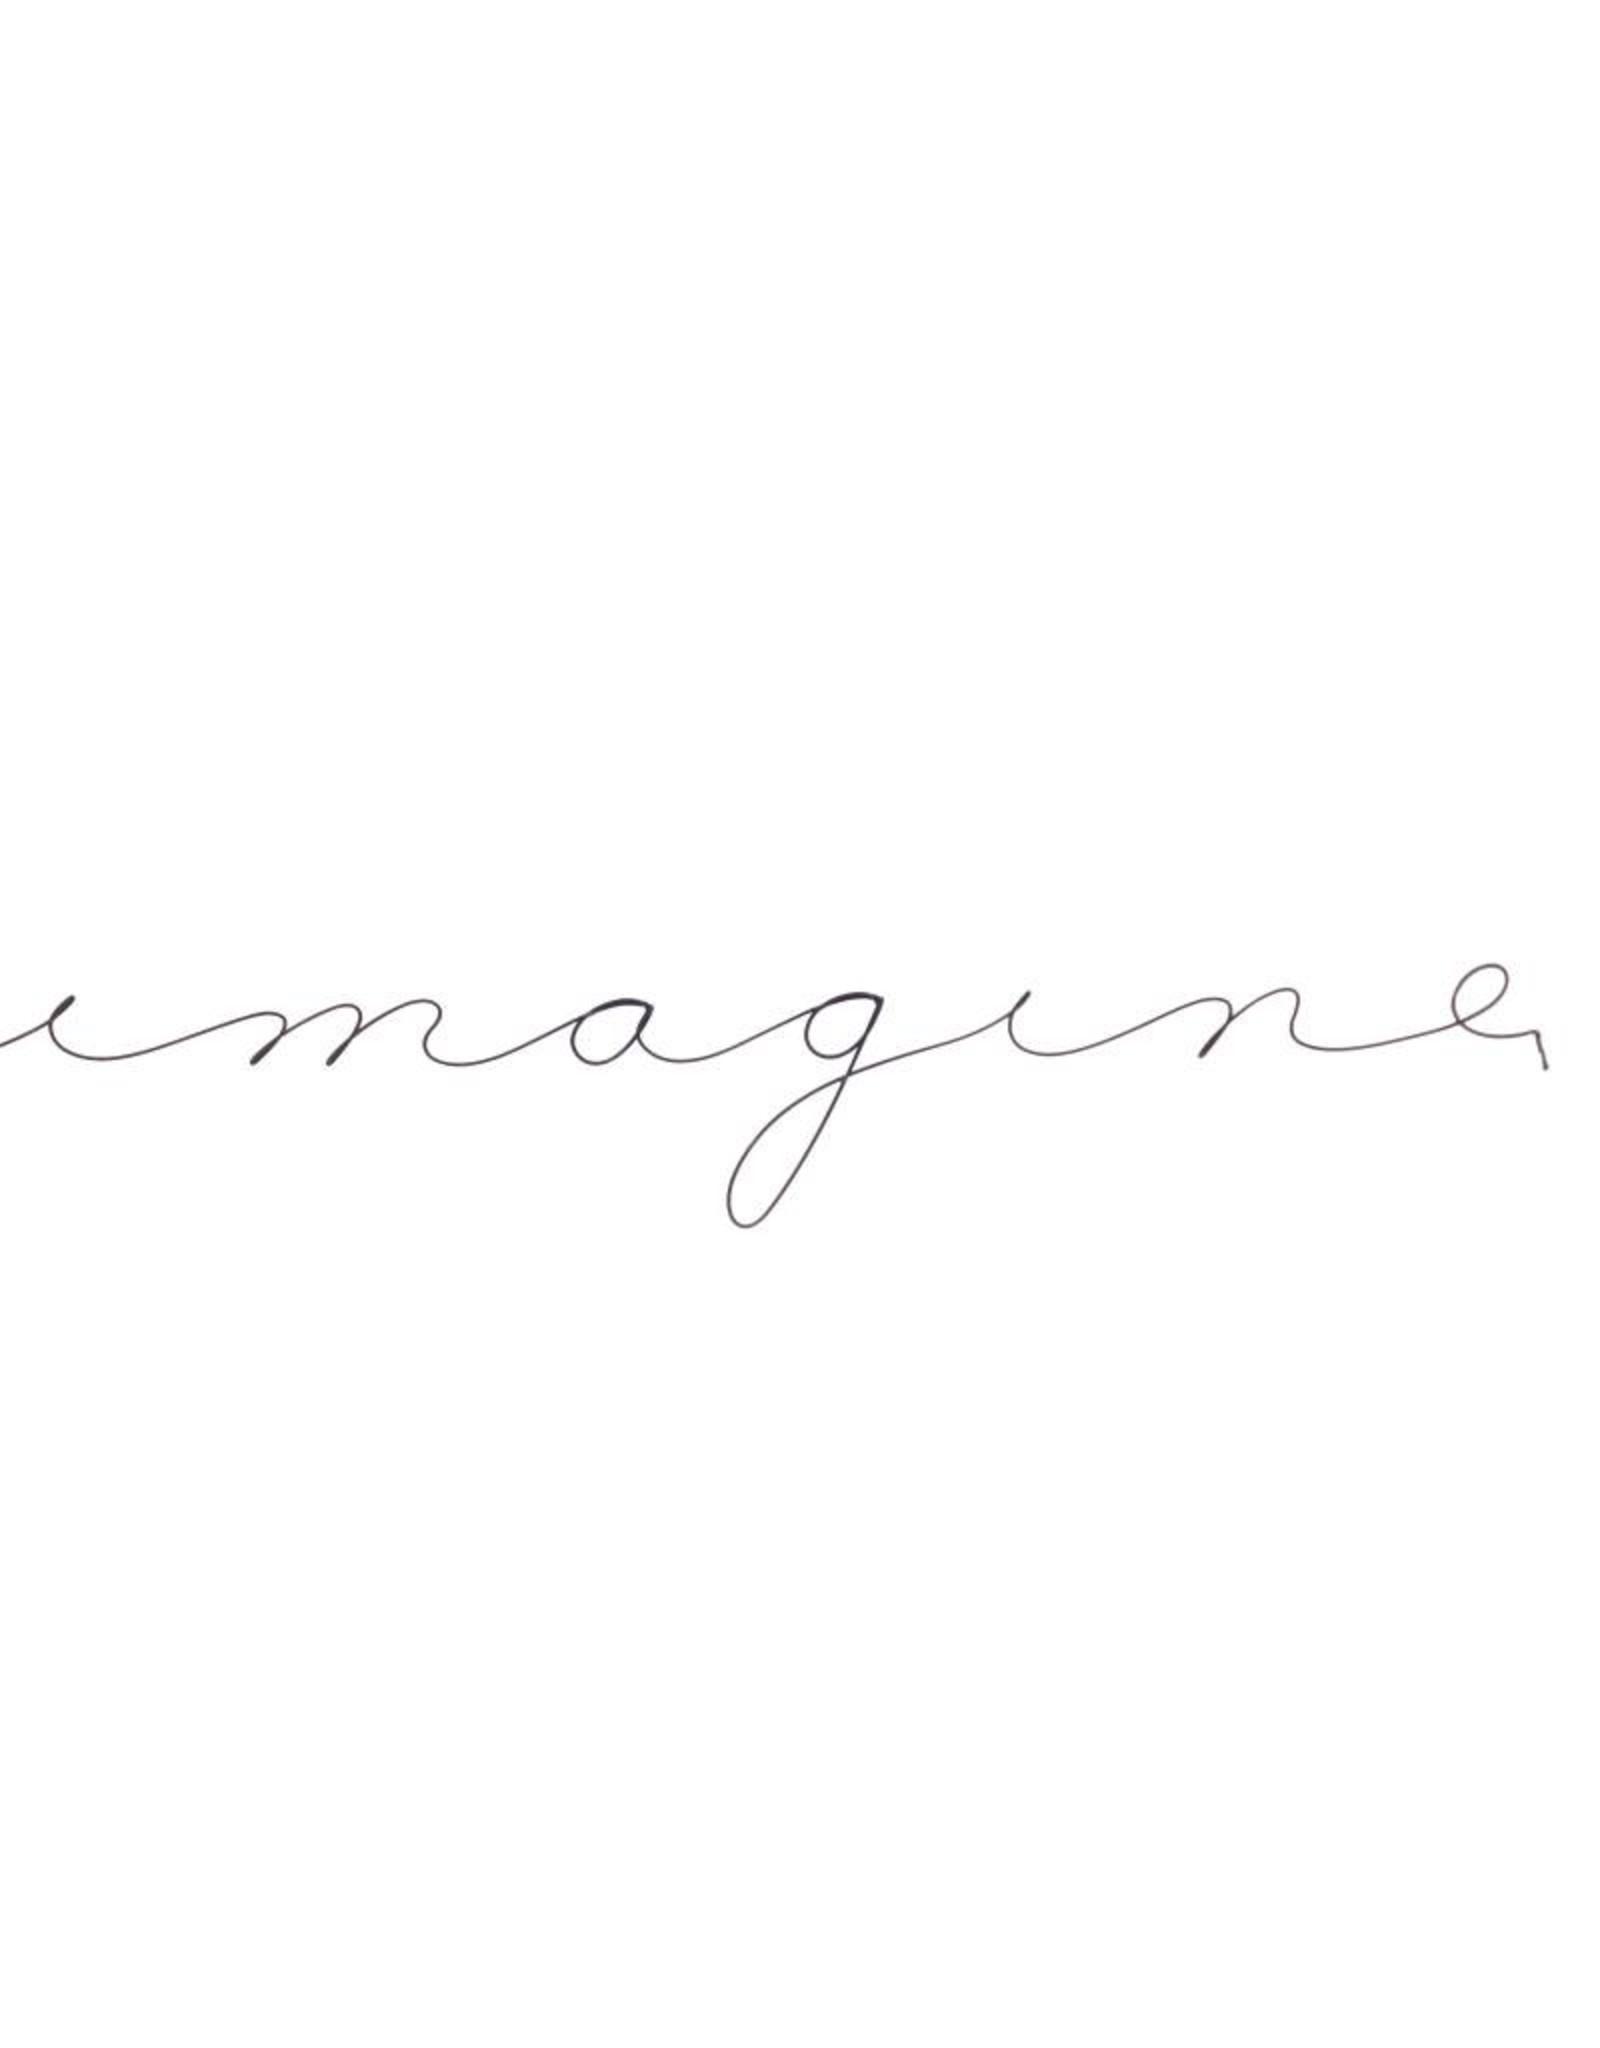 Gauge NYC 'imagine' Wire Word Poetic